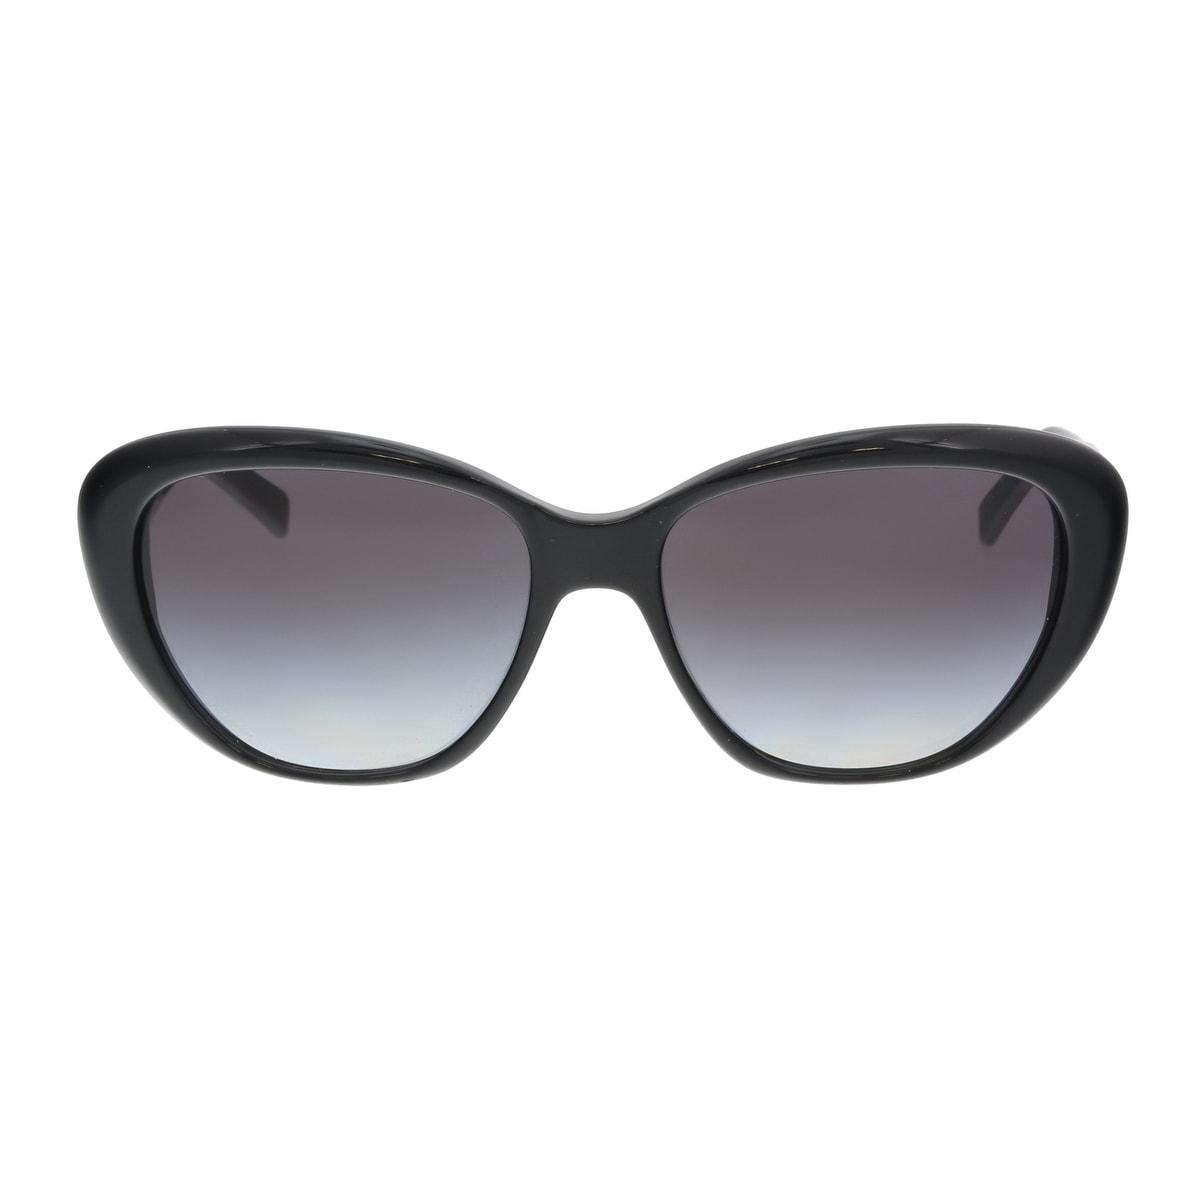 762c3ddf5309 Shop Tory Burch TY7005 501/11 Black Cat eye Sunglasses - 56-15-135 ...